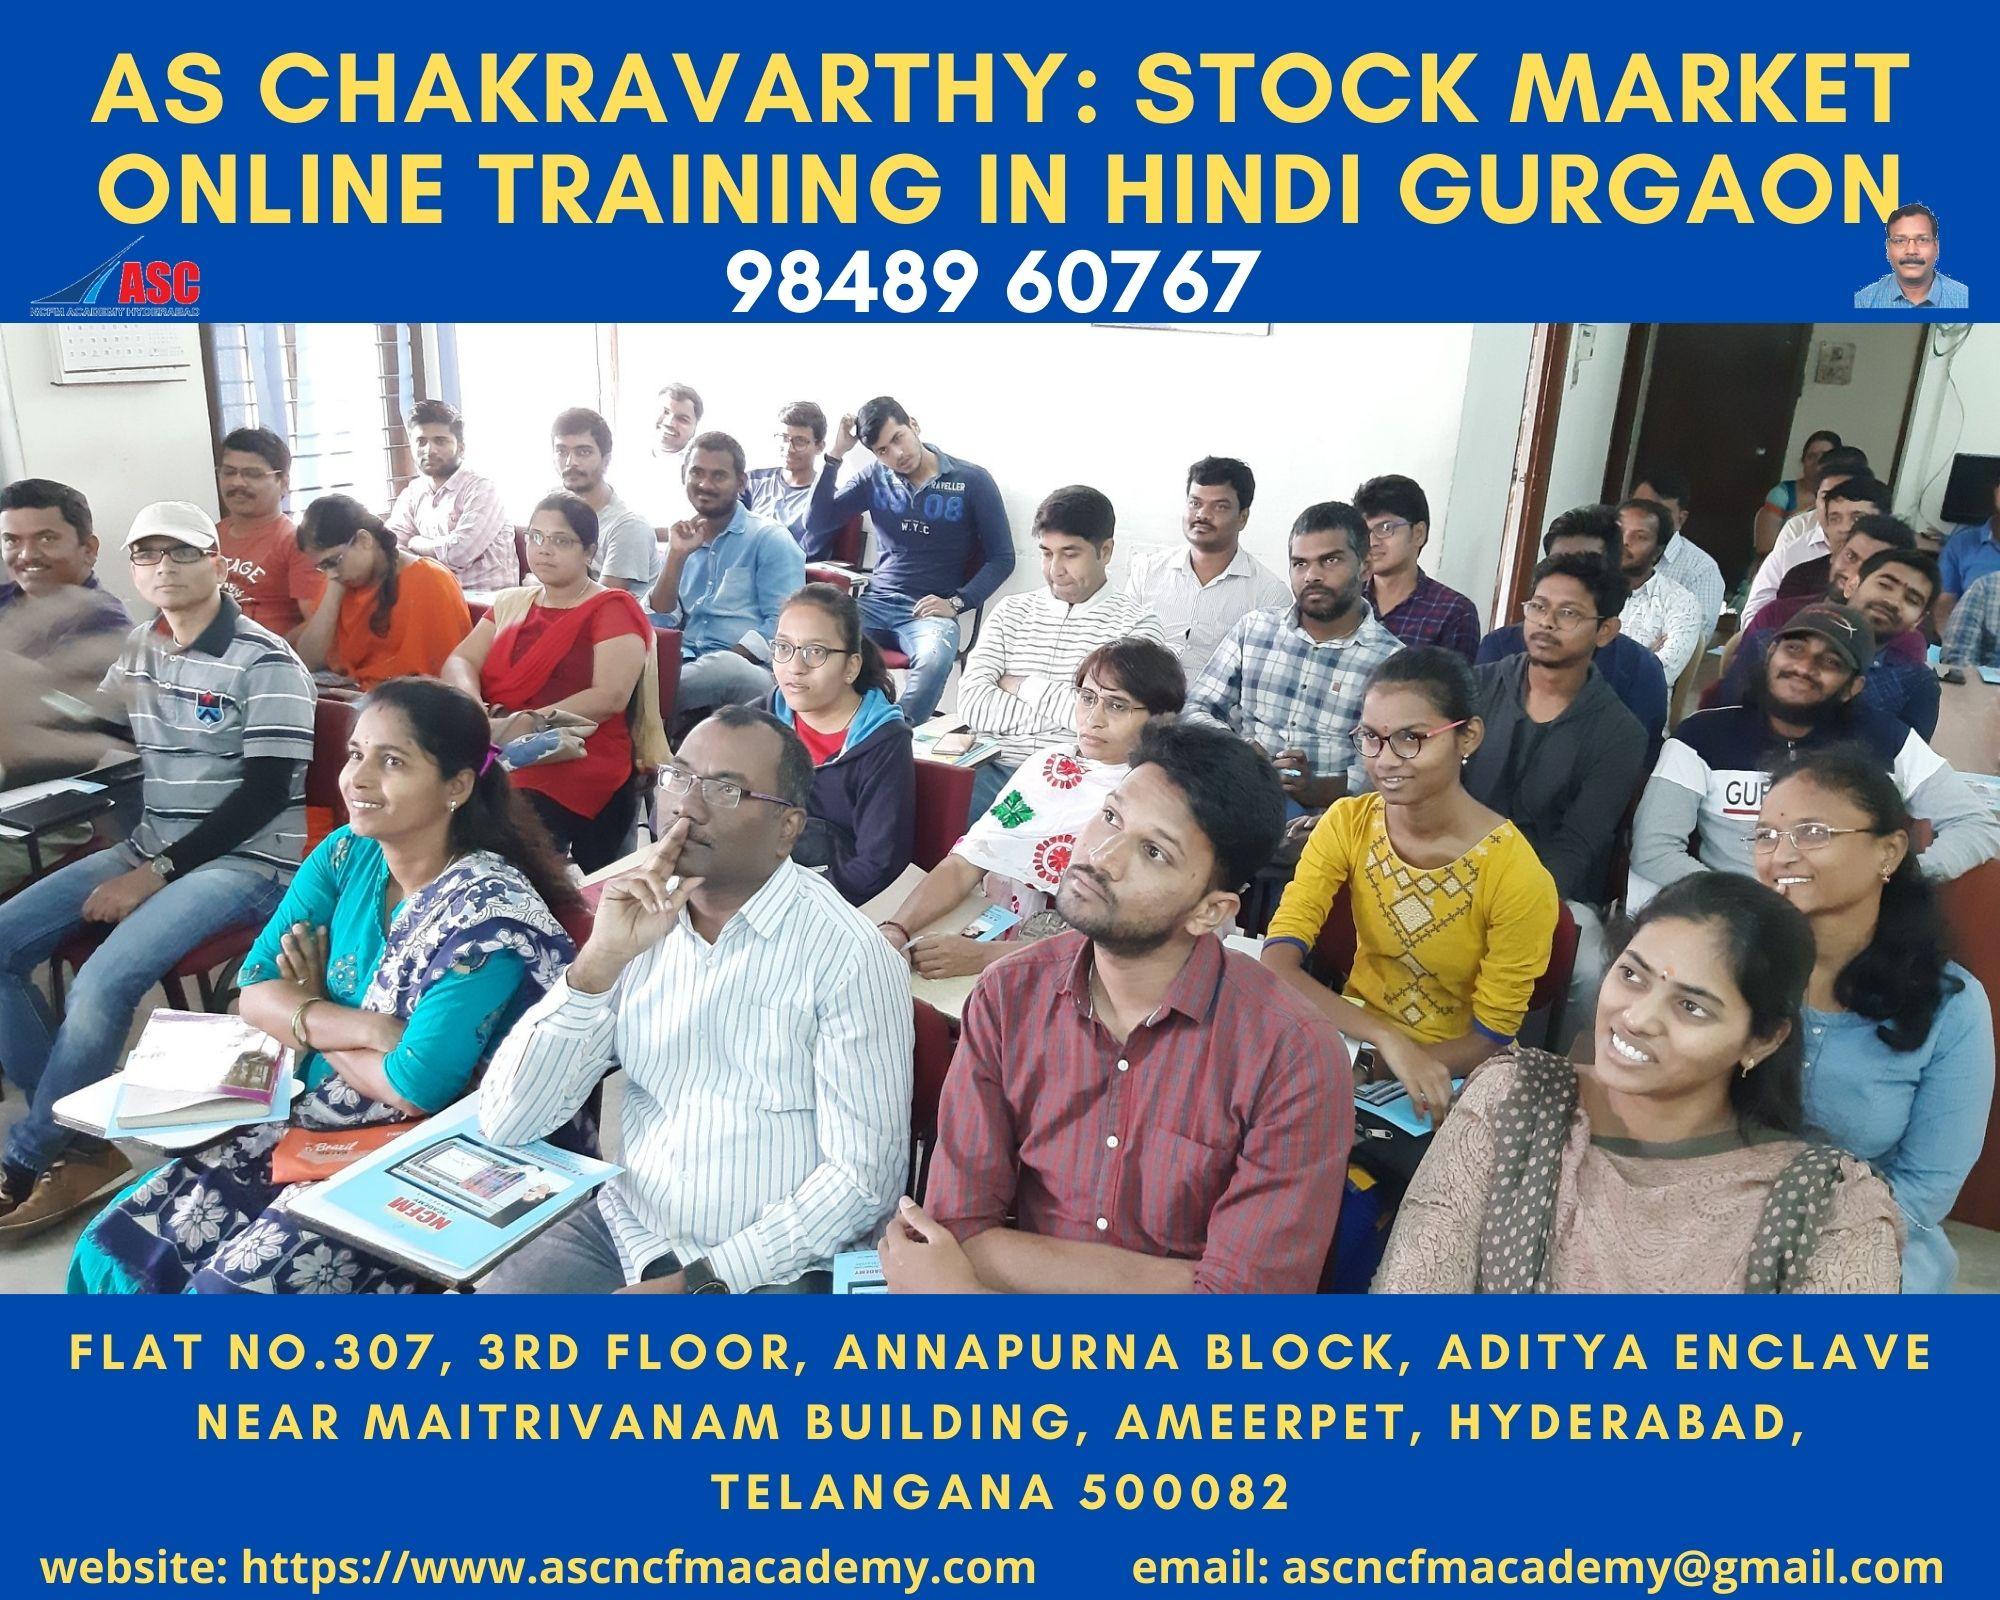 Online Stock Market Technical Training in Hindi Gurgaon